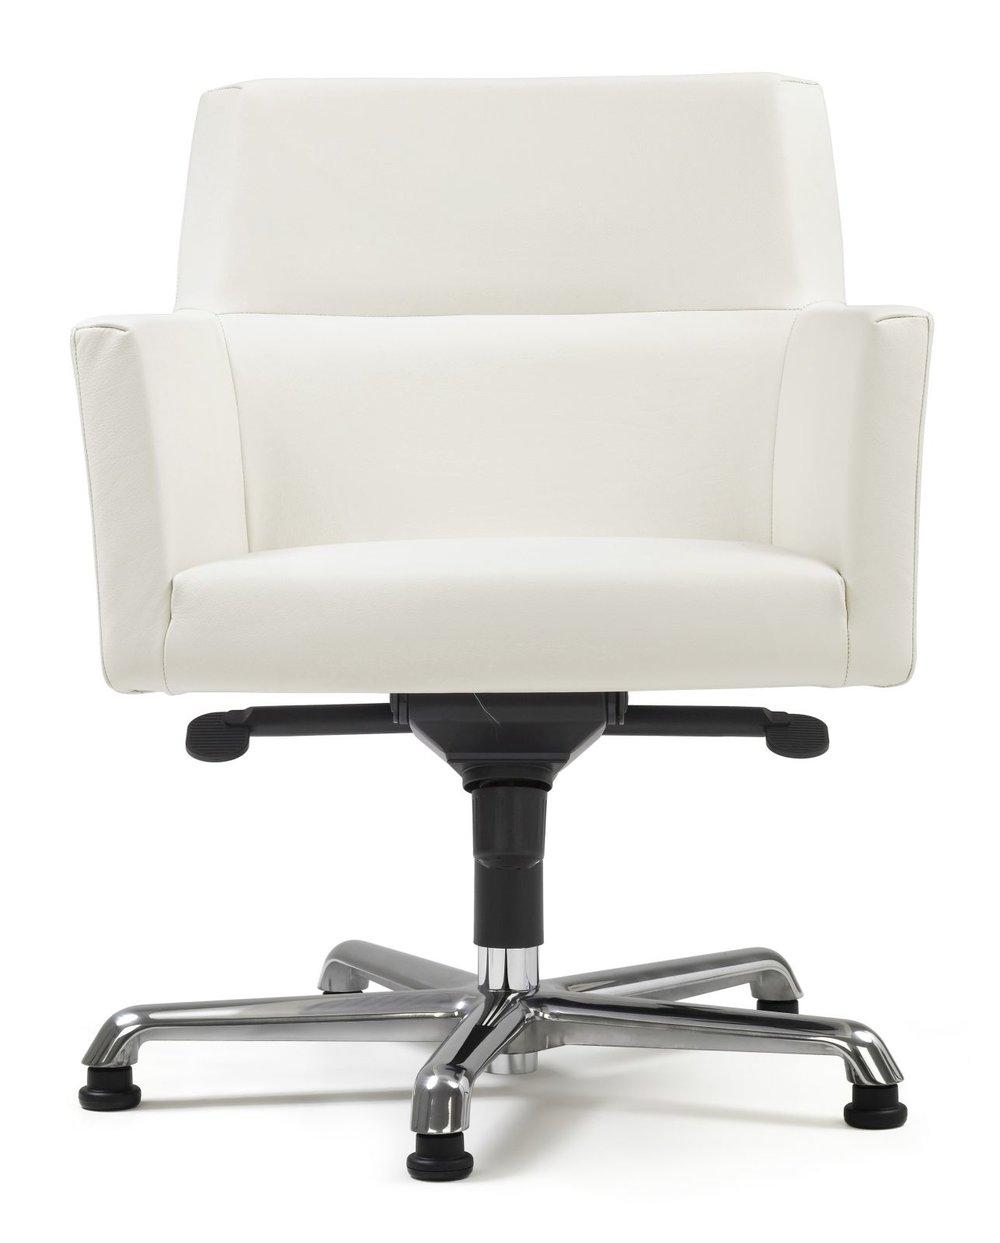 modern-office-chairs-Italian-furniture-designer-chairs (11).jpg